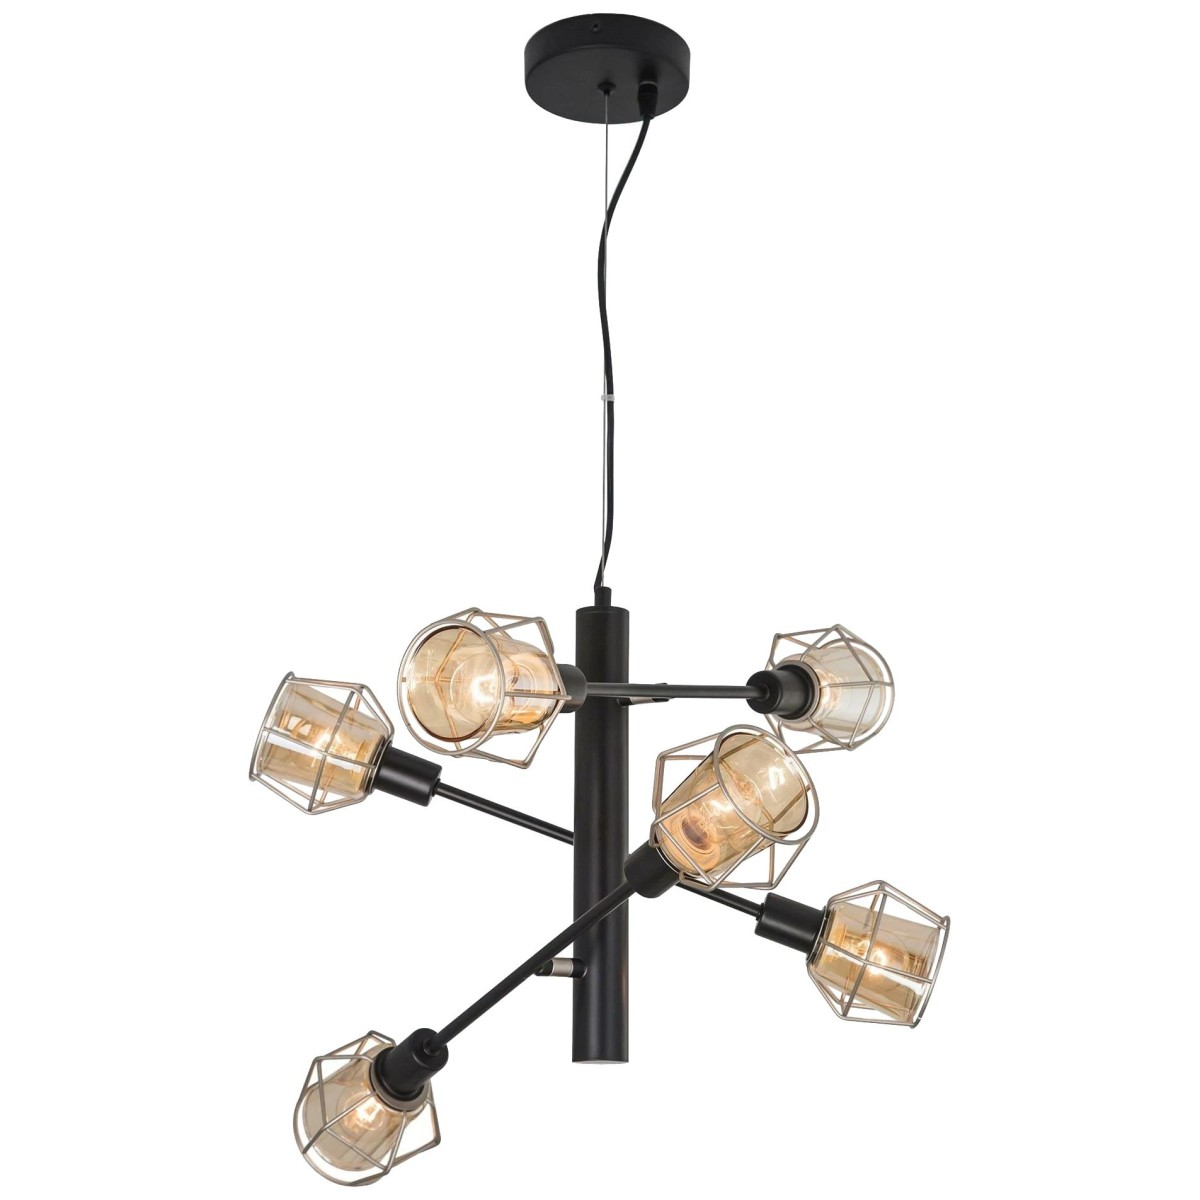 Люстра Citilux Таверна Cl542161 E14 6 Ламп 17 М²